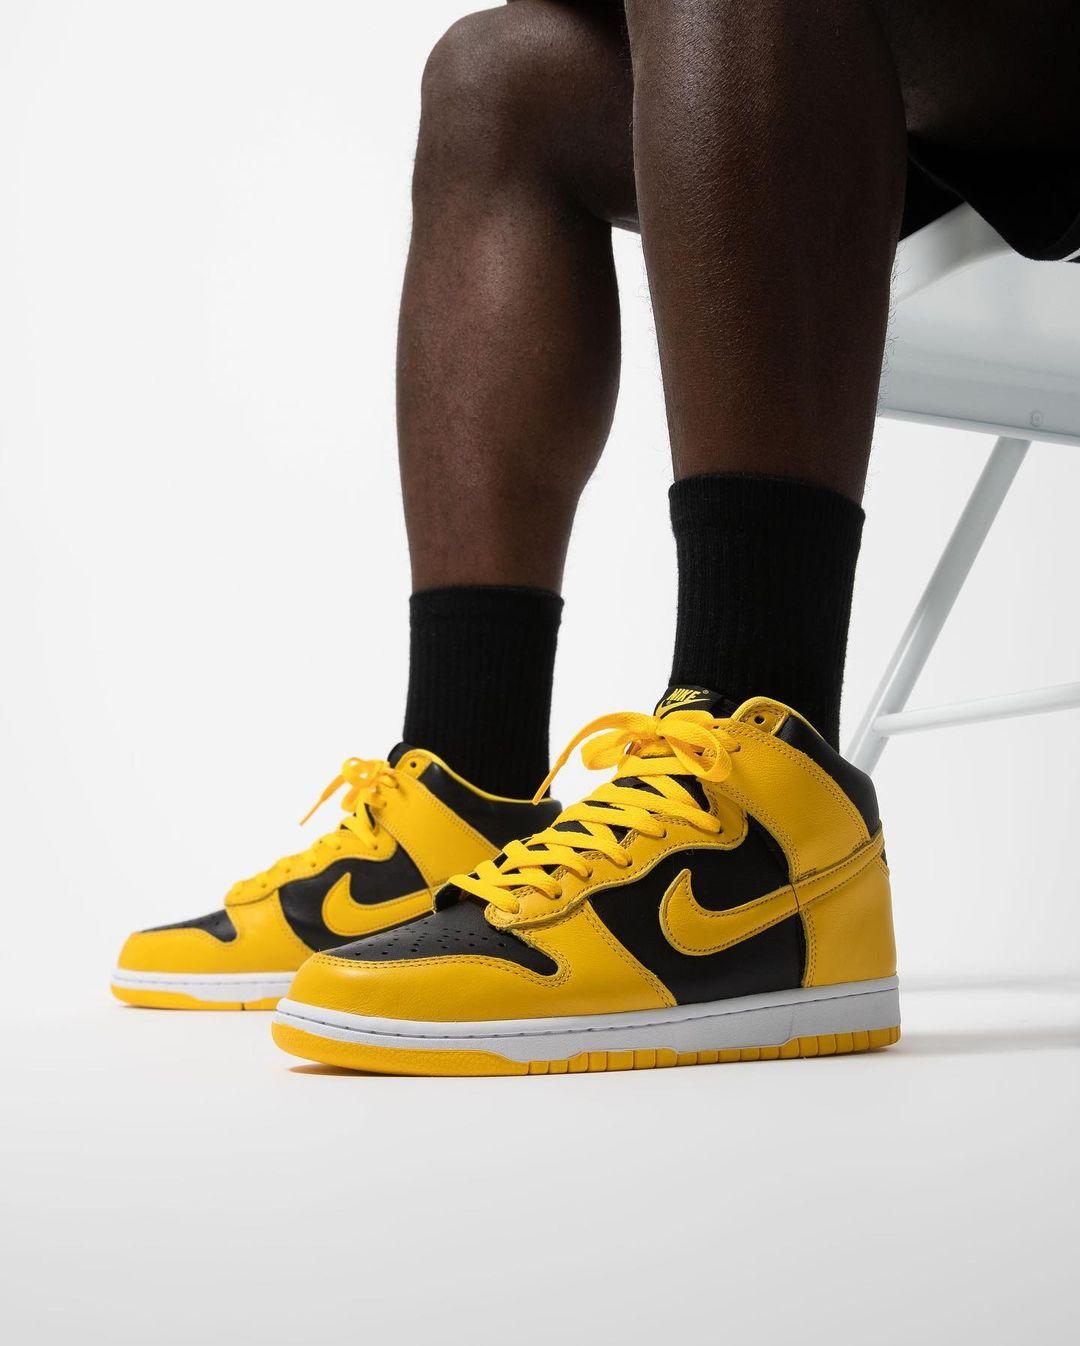 Nike,Dunk High,CZ8149-002,发售  「小武当」Dunk Hi 下周发售!国内发售预告释出!